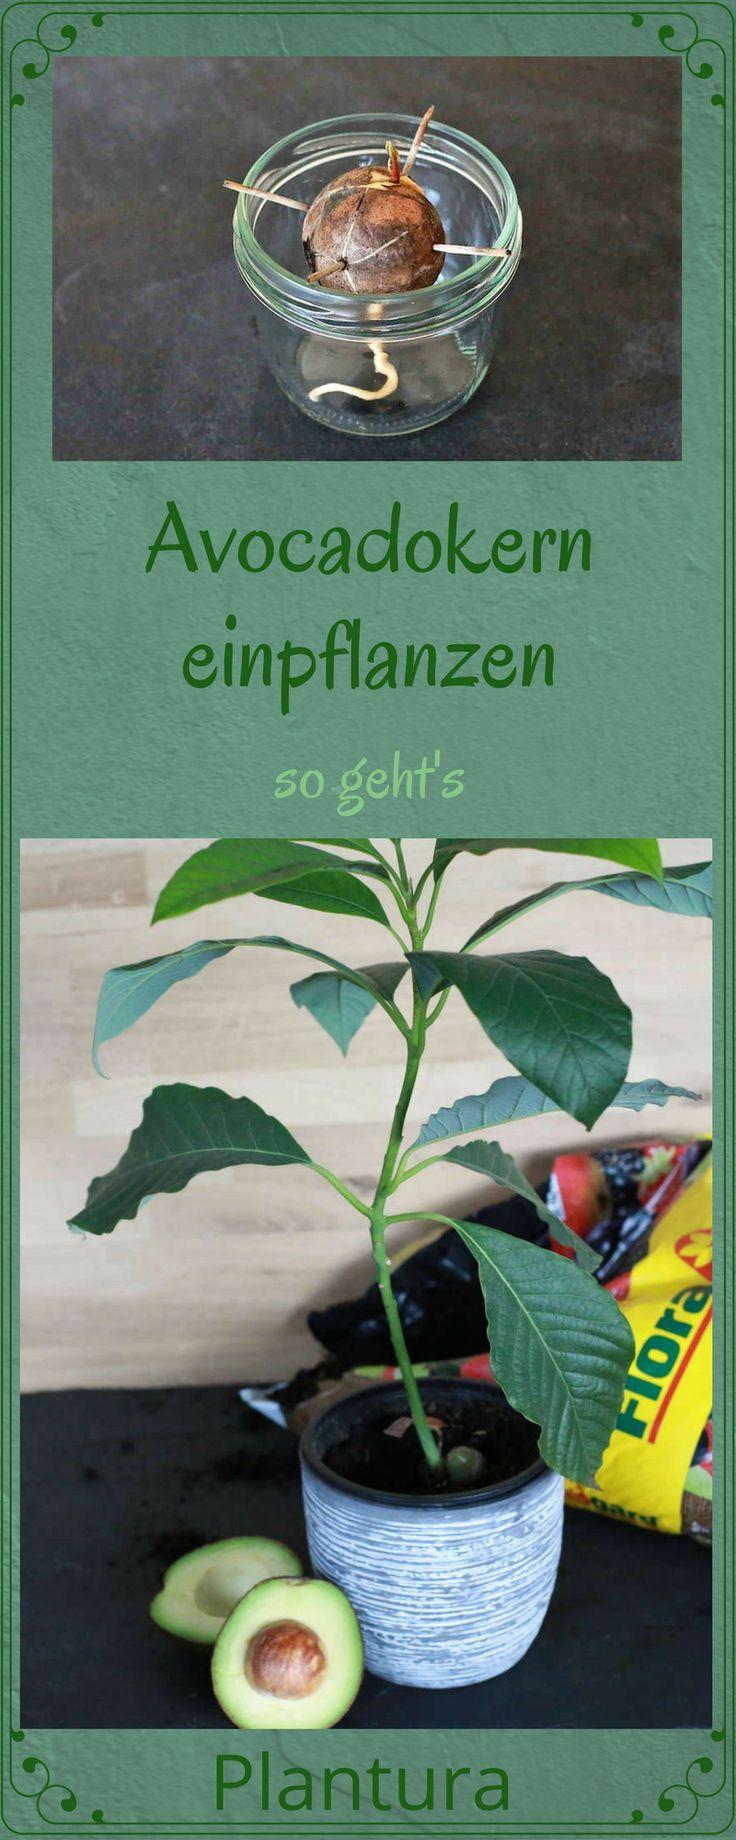 Avocadokern pflanzen: Avocado-Anbau zu Hause – Plantura